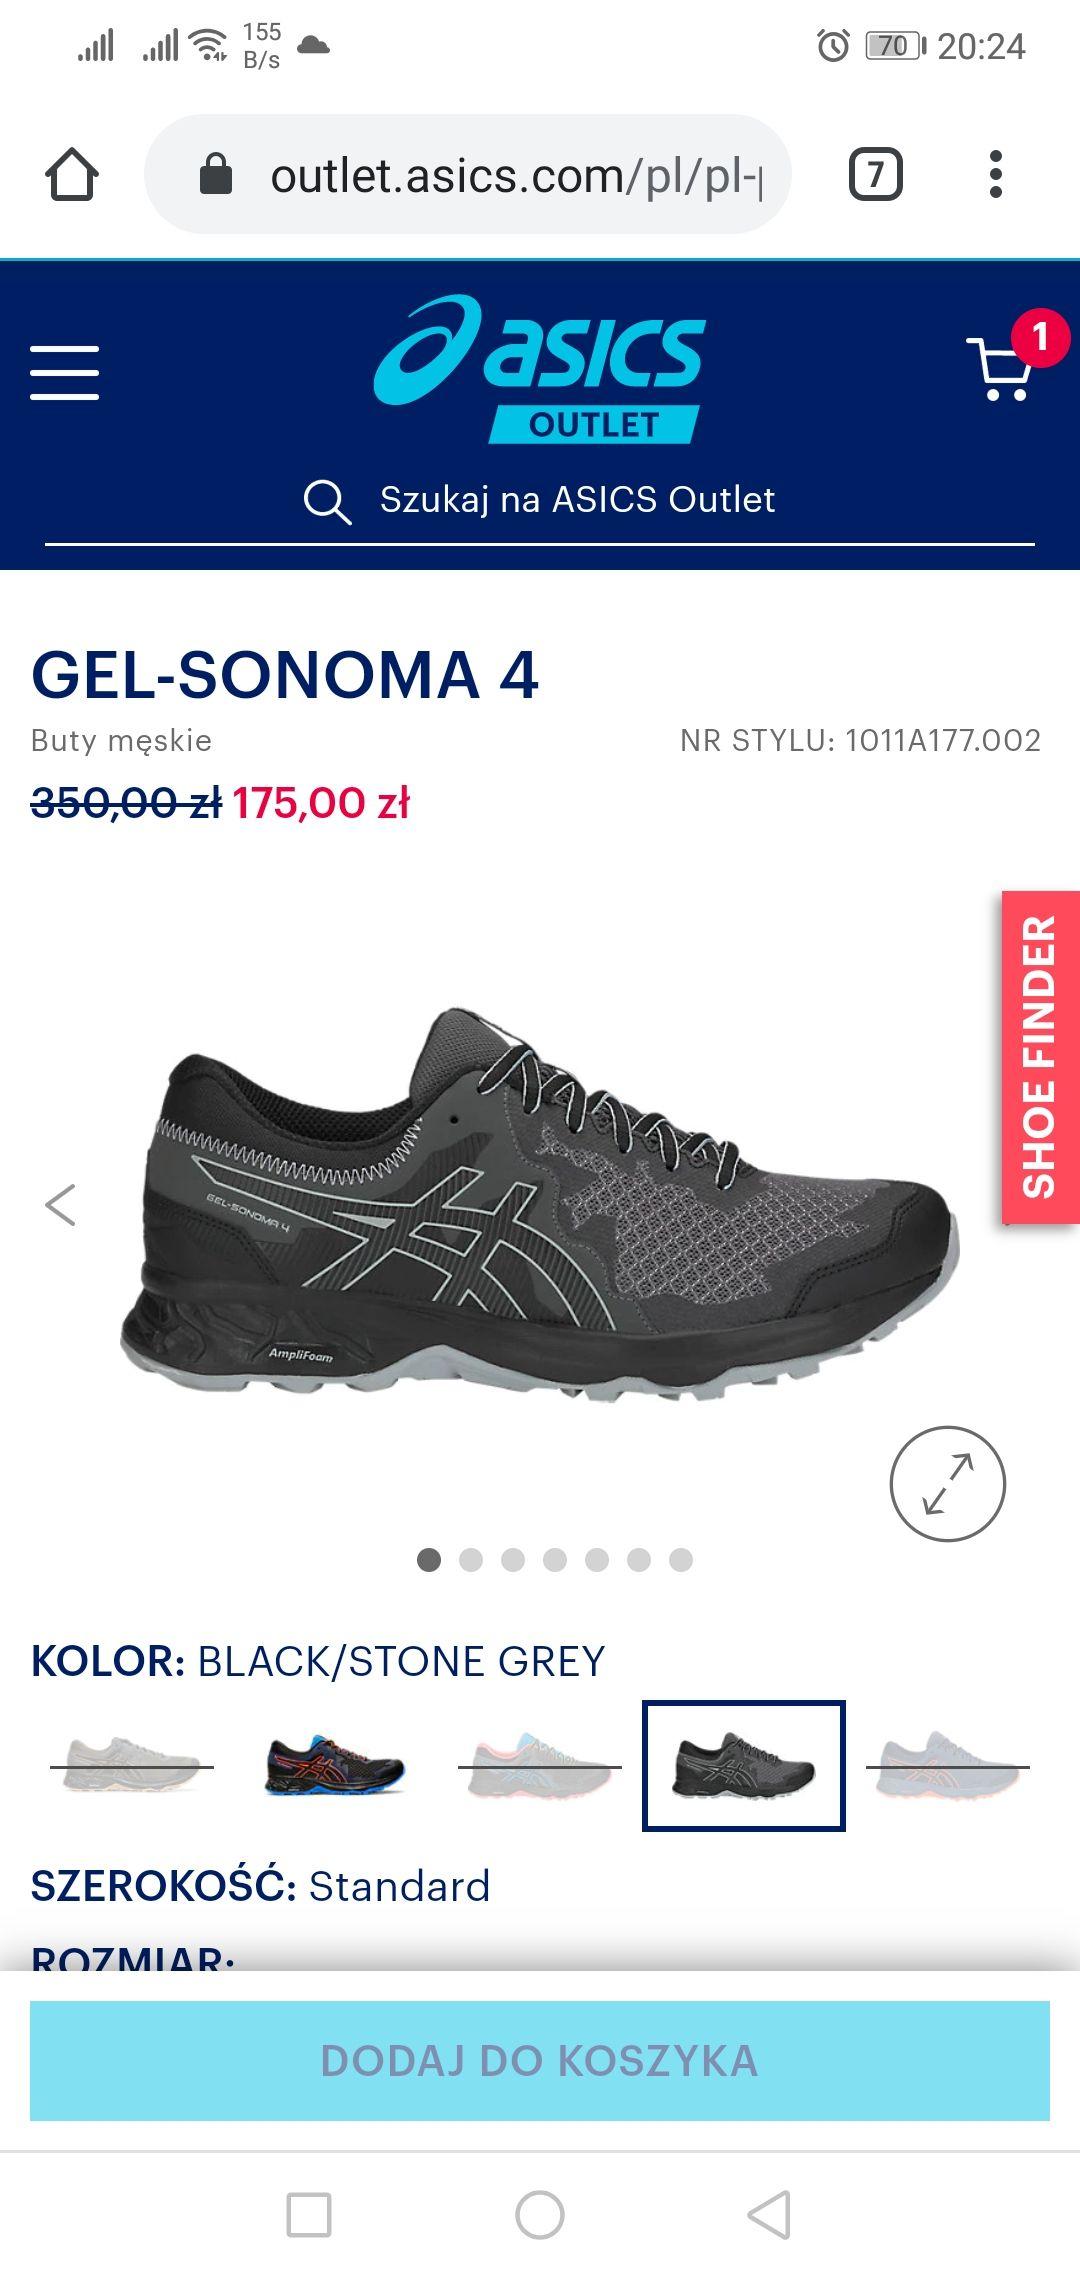 Asics GEL-SONOMA 4